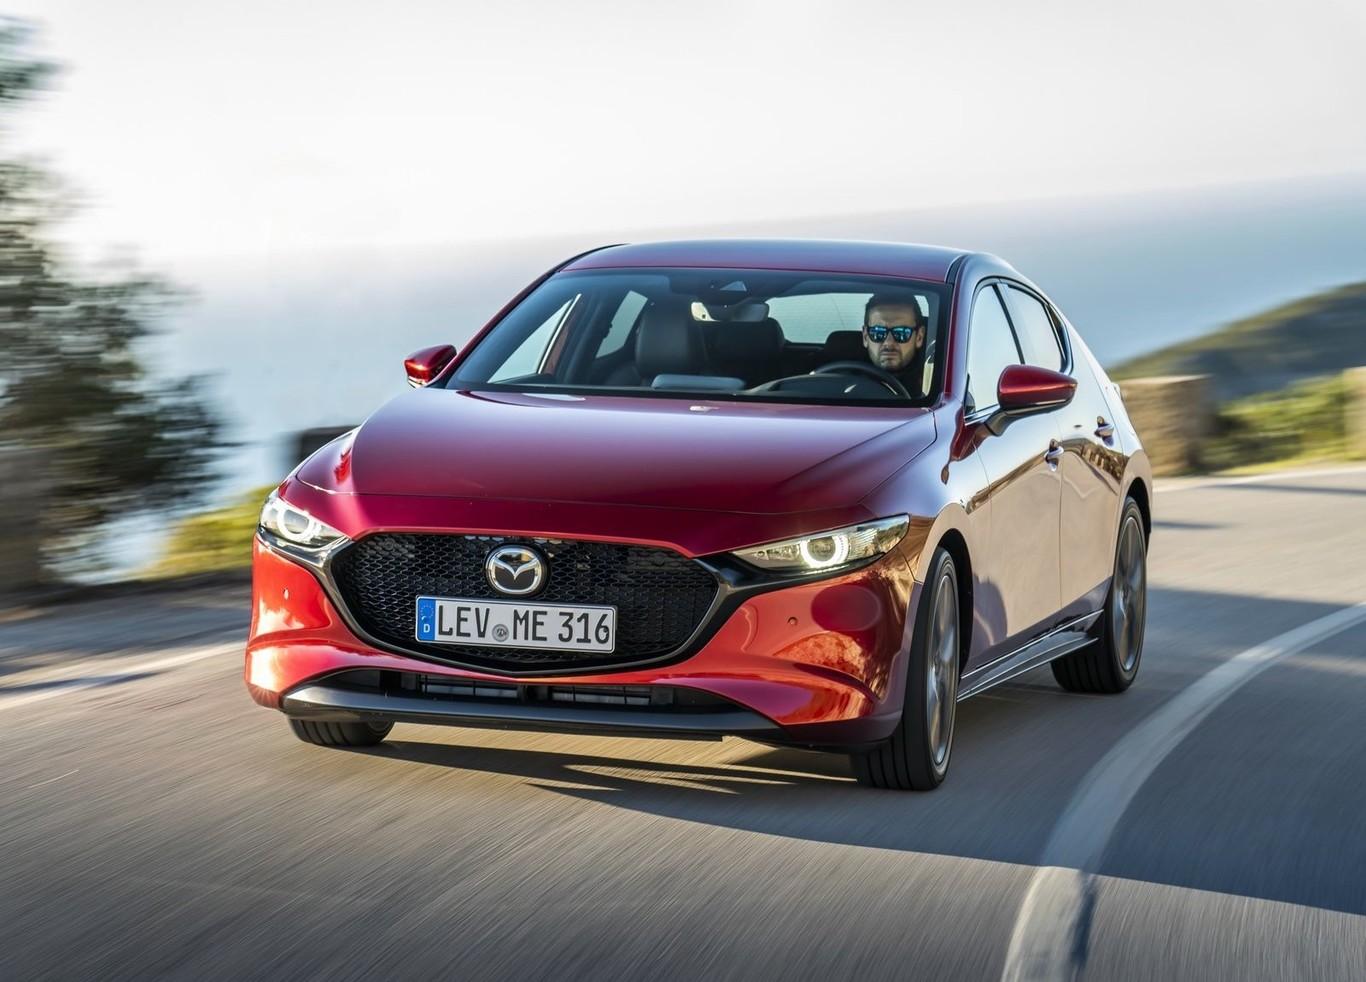 2021 Mazda 3 Sedan Spesification